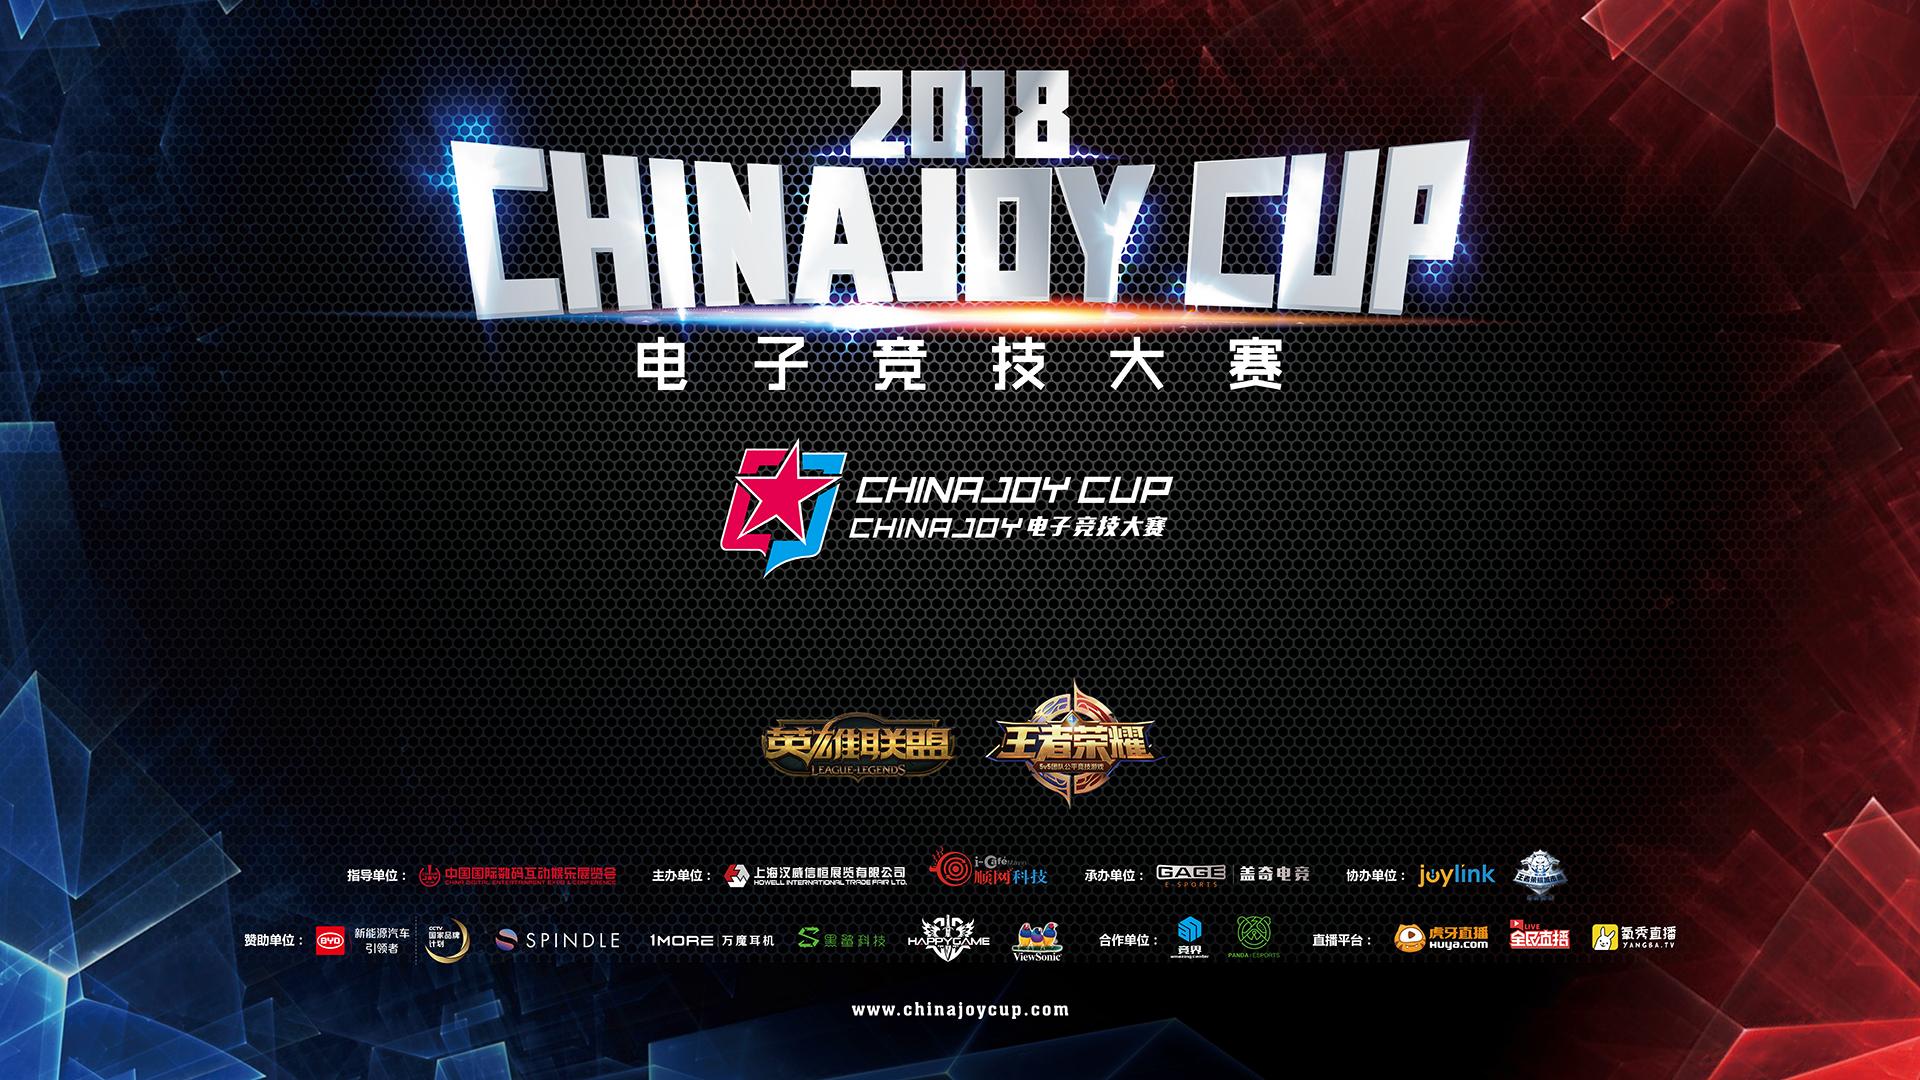 2018 ChinaJoy 电子竞技大赛柳州赛区A组现已决出优胜者!